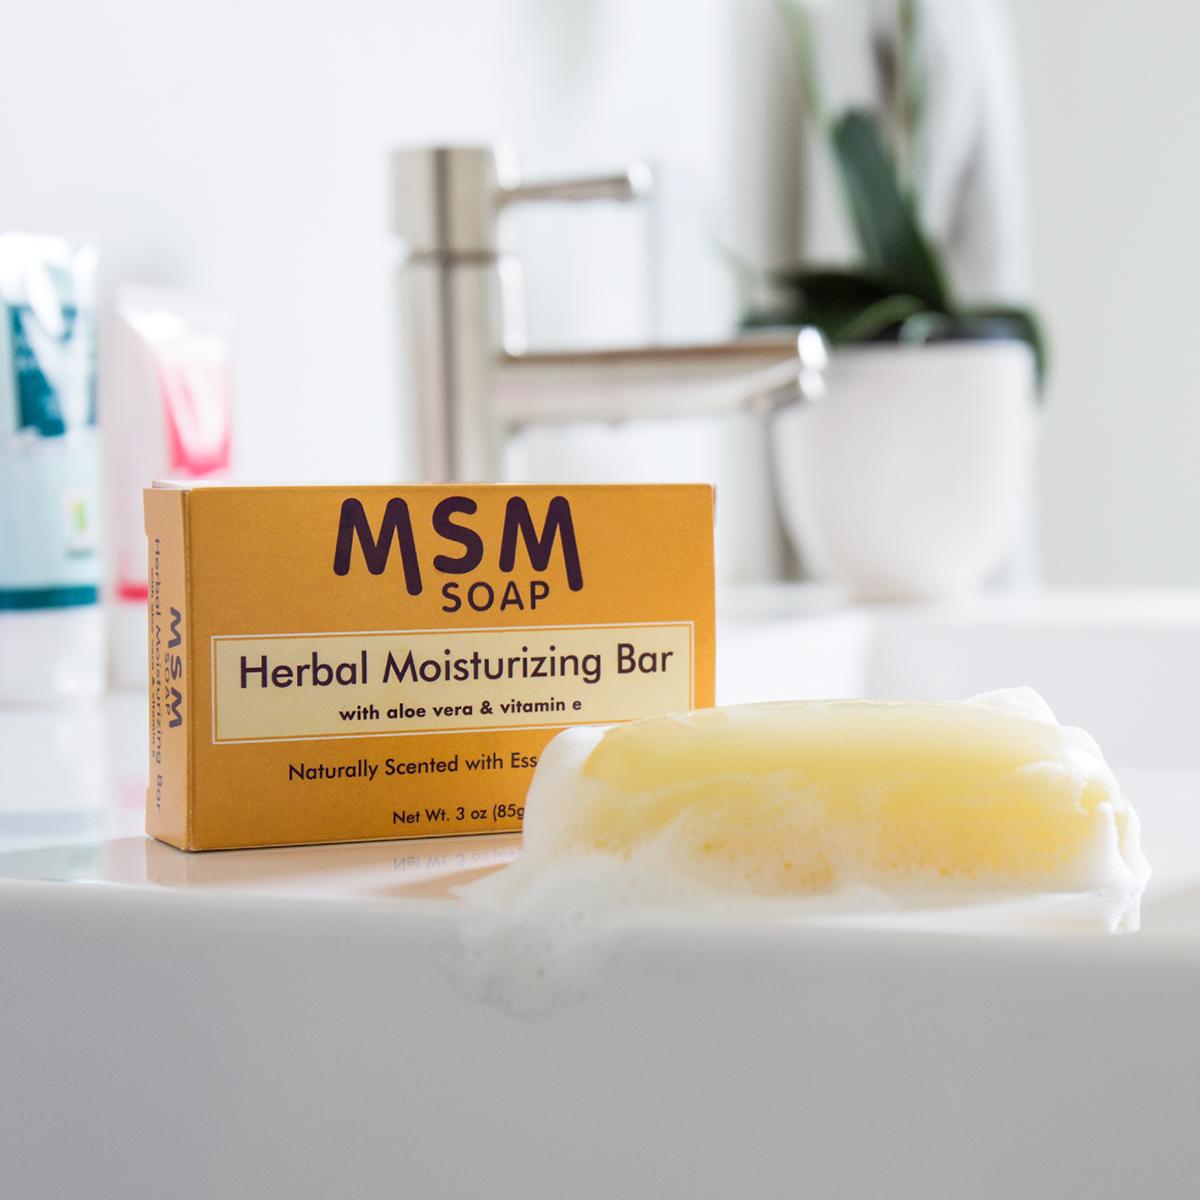 MSM-Soap-lifestyle.jpg